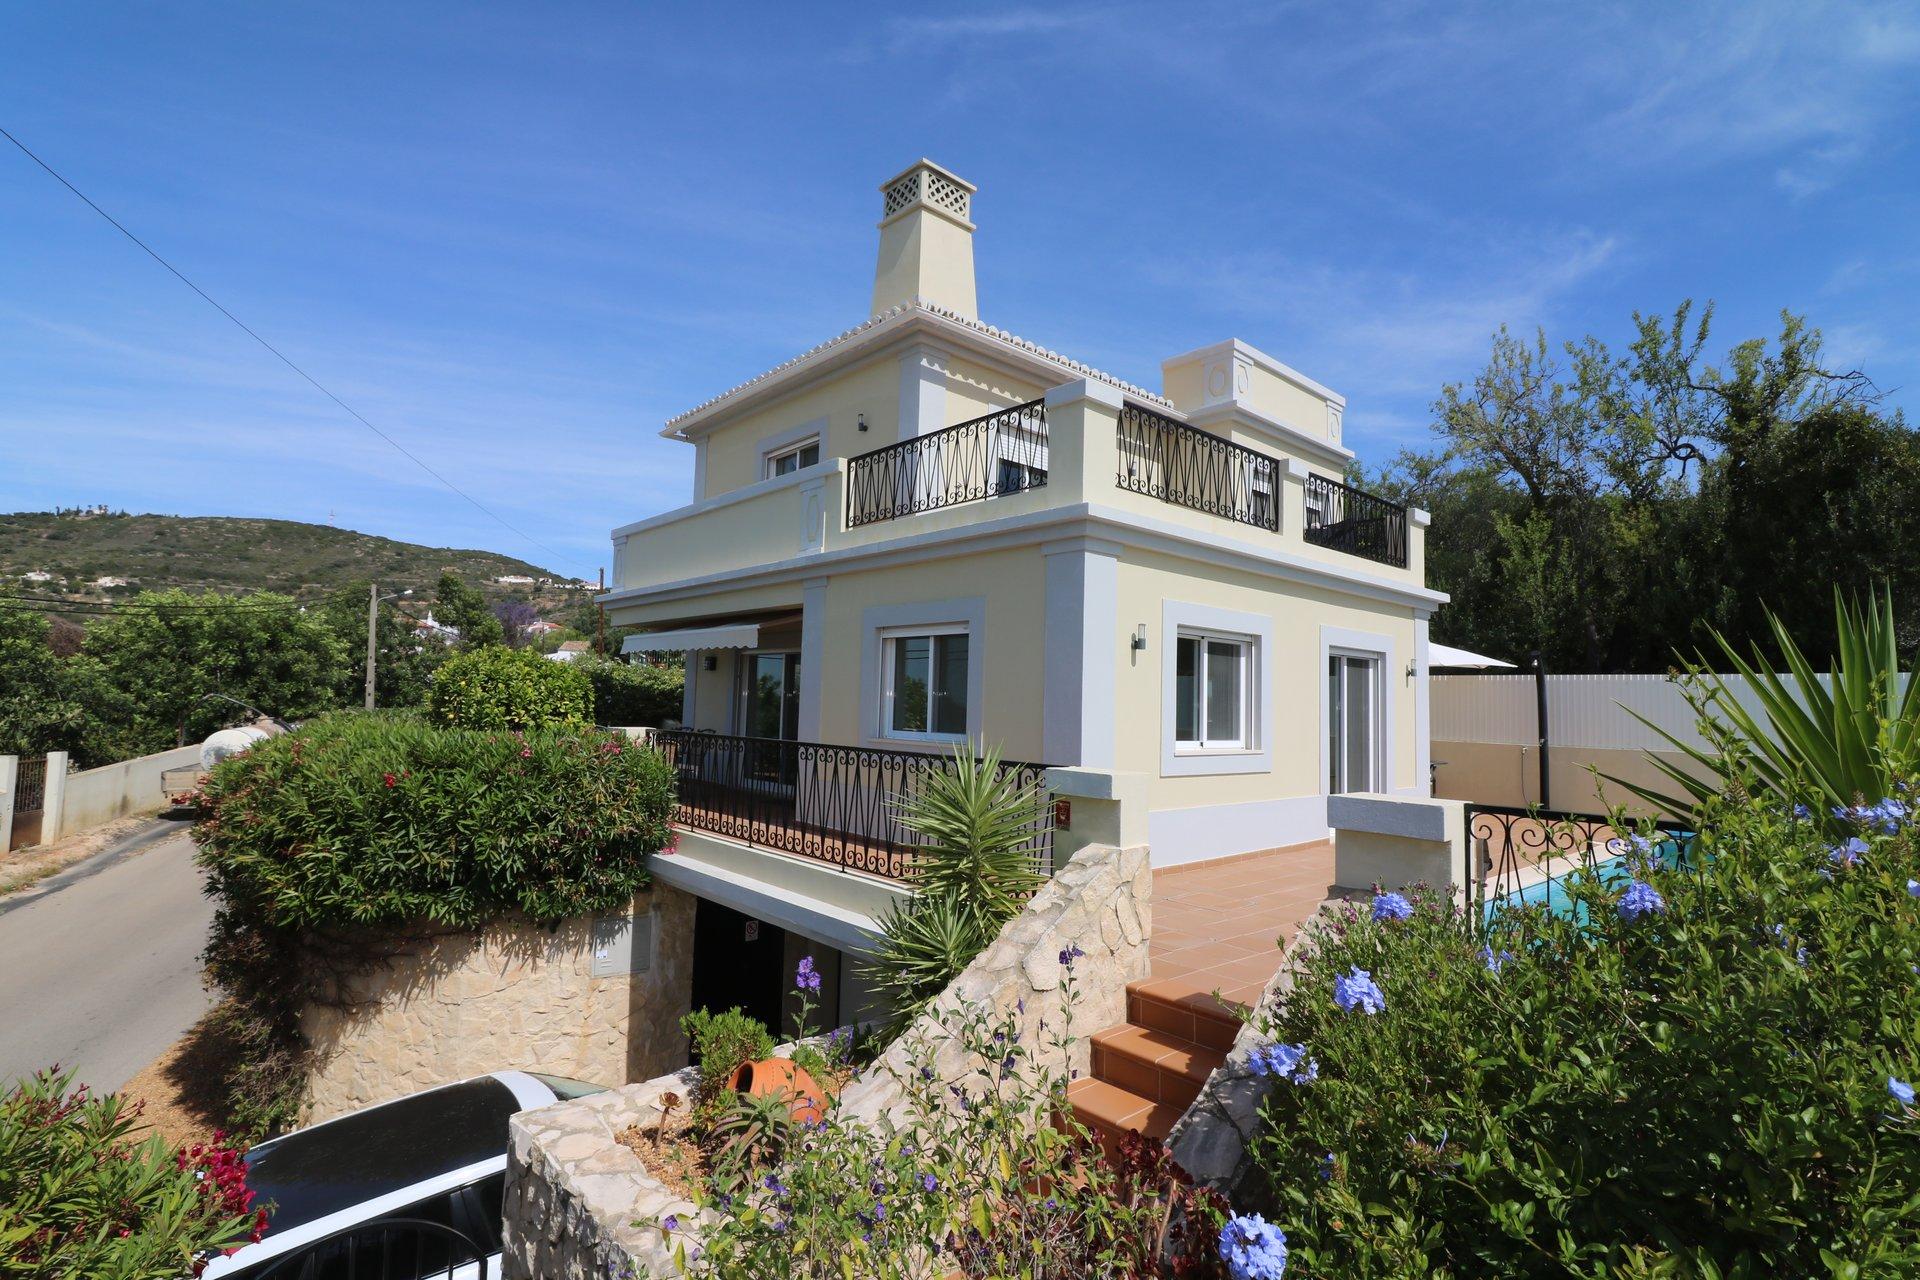 3 Bedroom Villa Santa Barbara de Nexe, Central Algarve Ref: JV10358